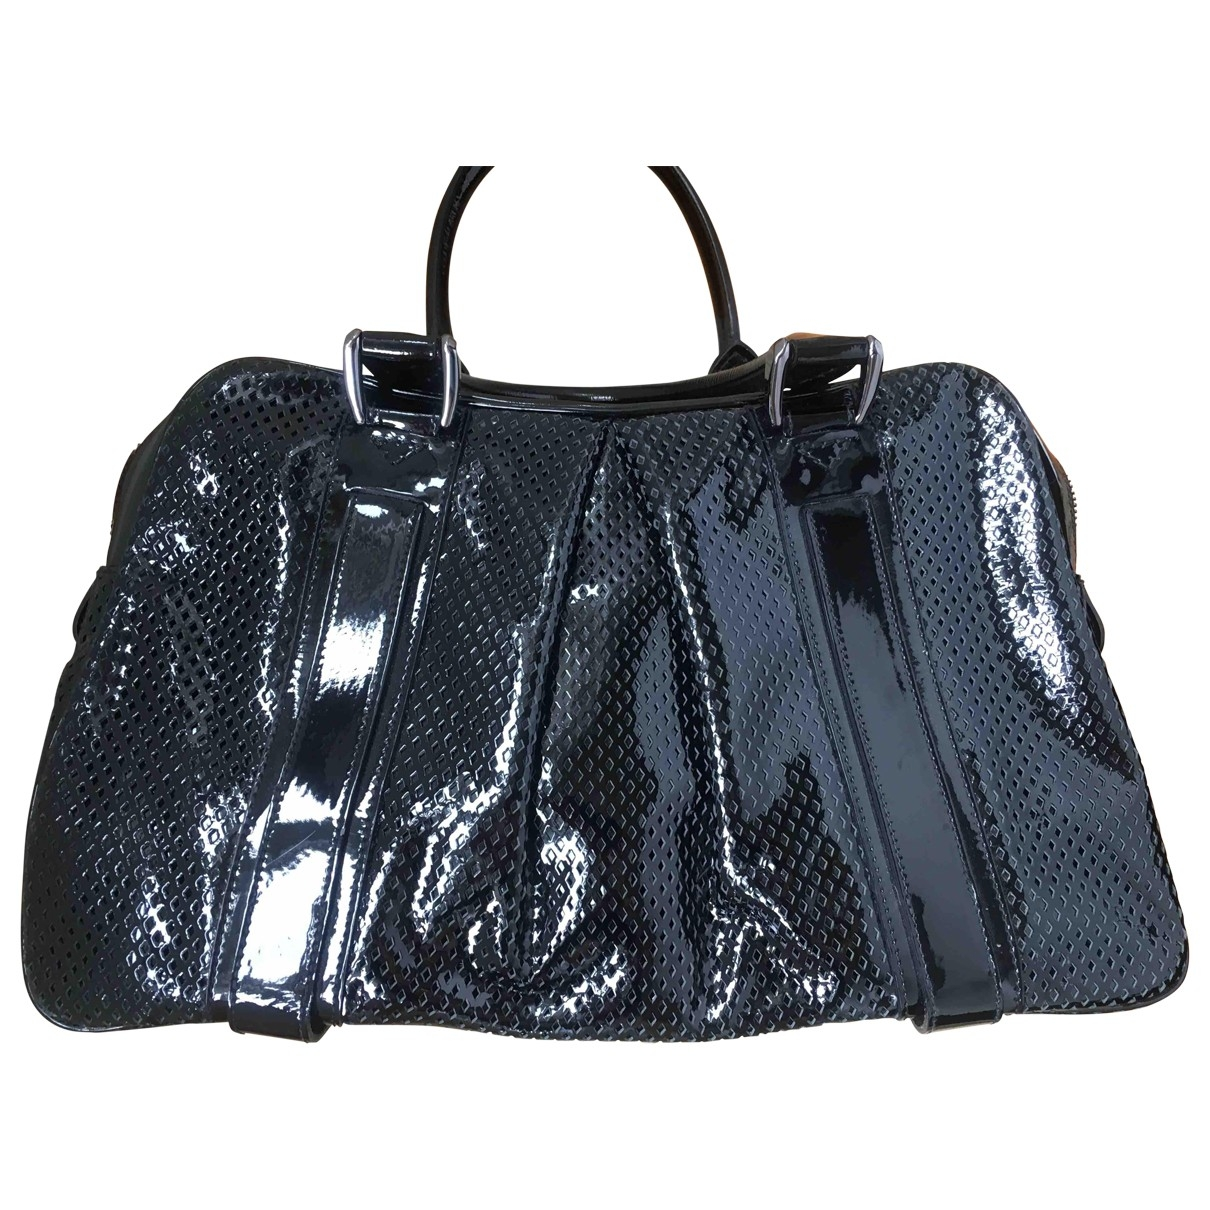 Burberry \N Black Patent leather handbag for Women \N